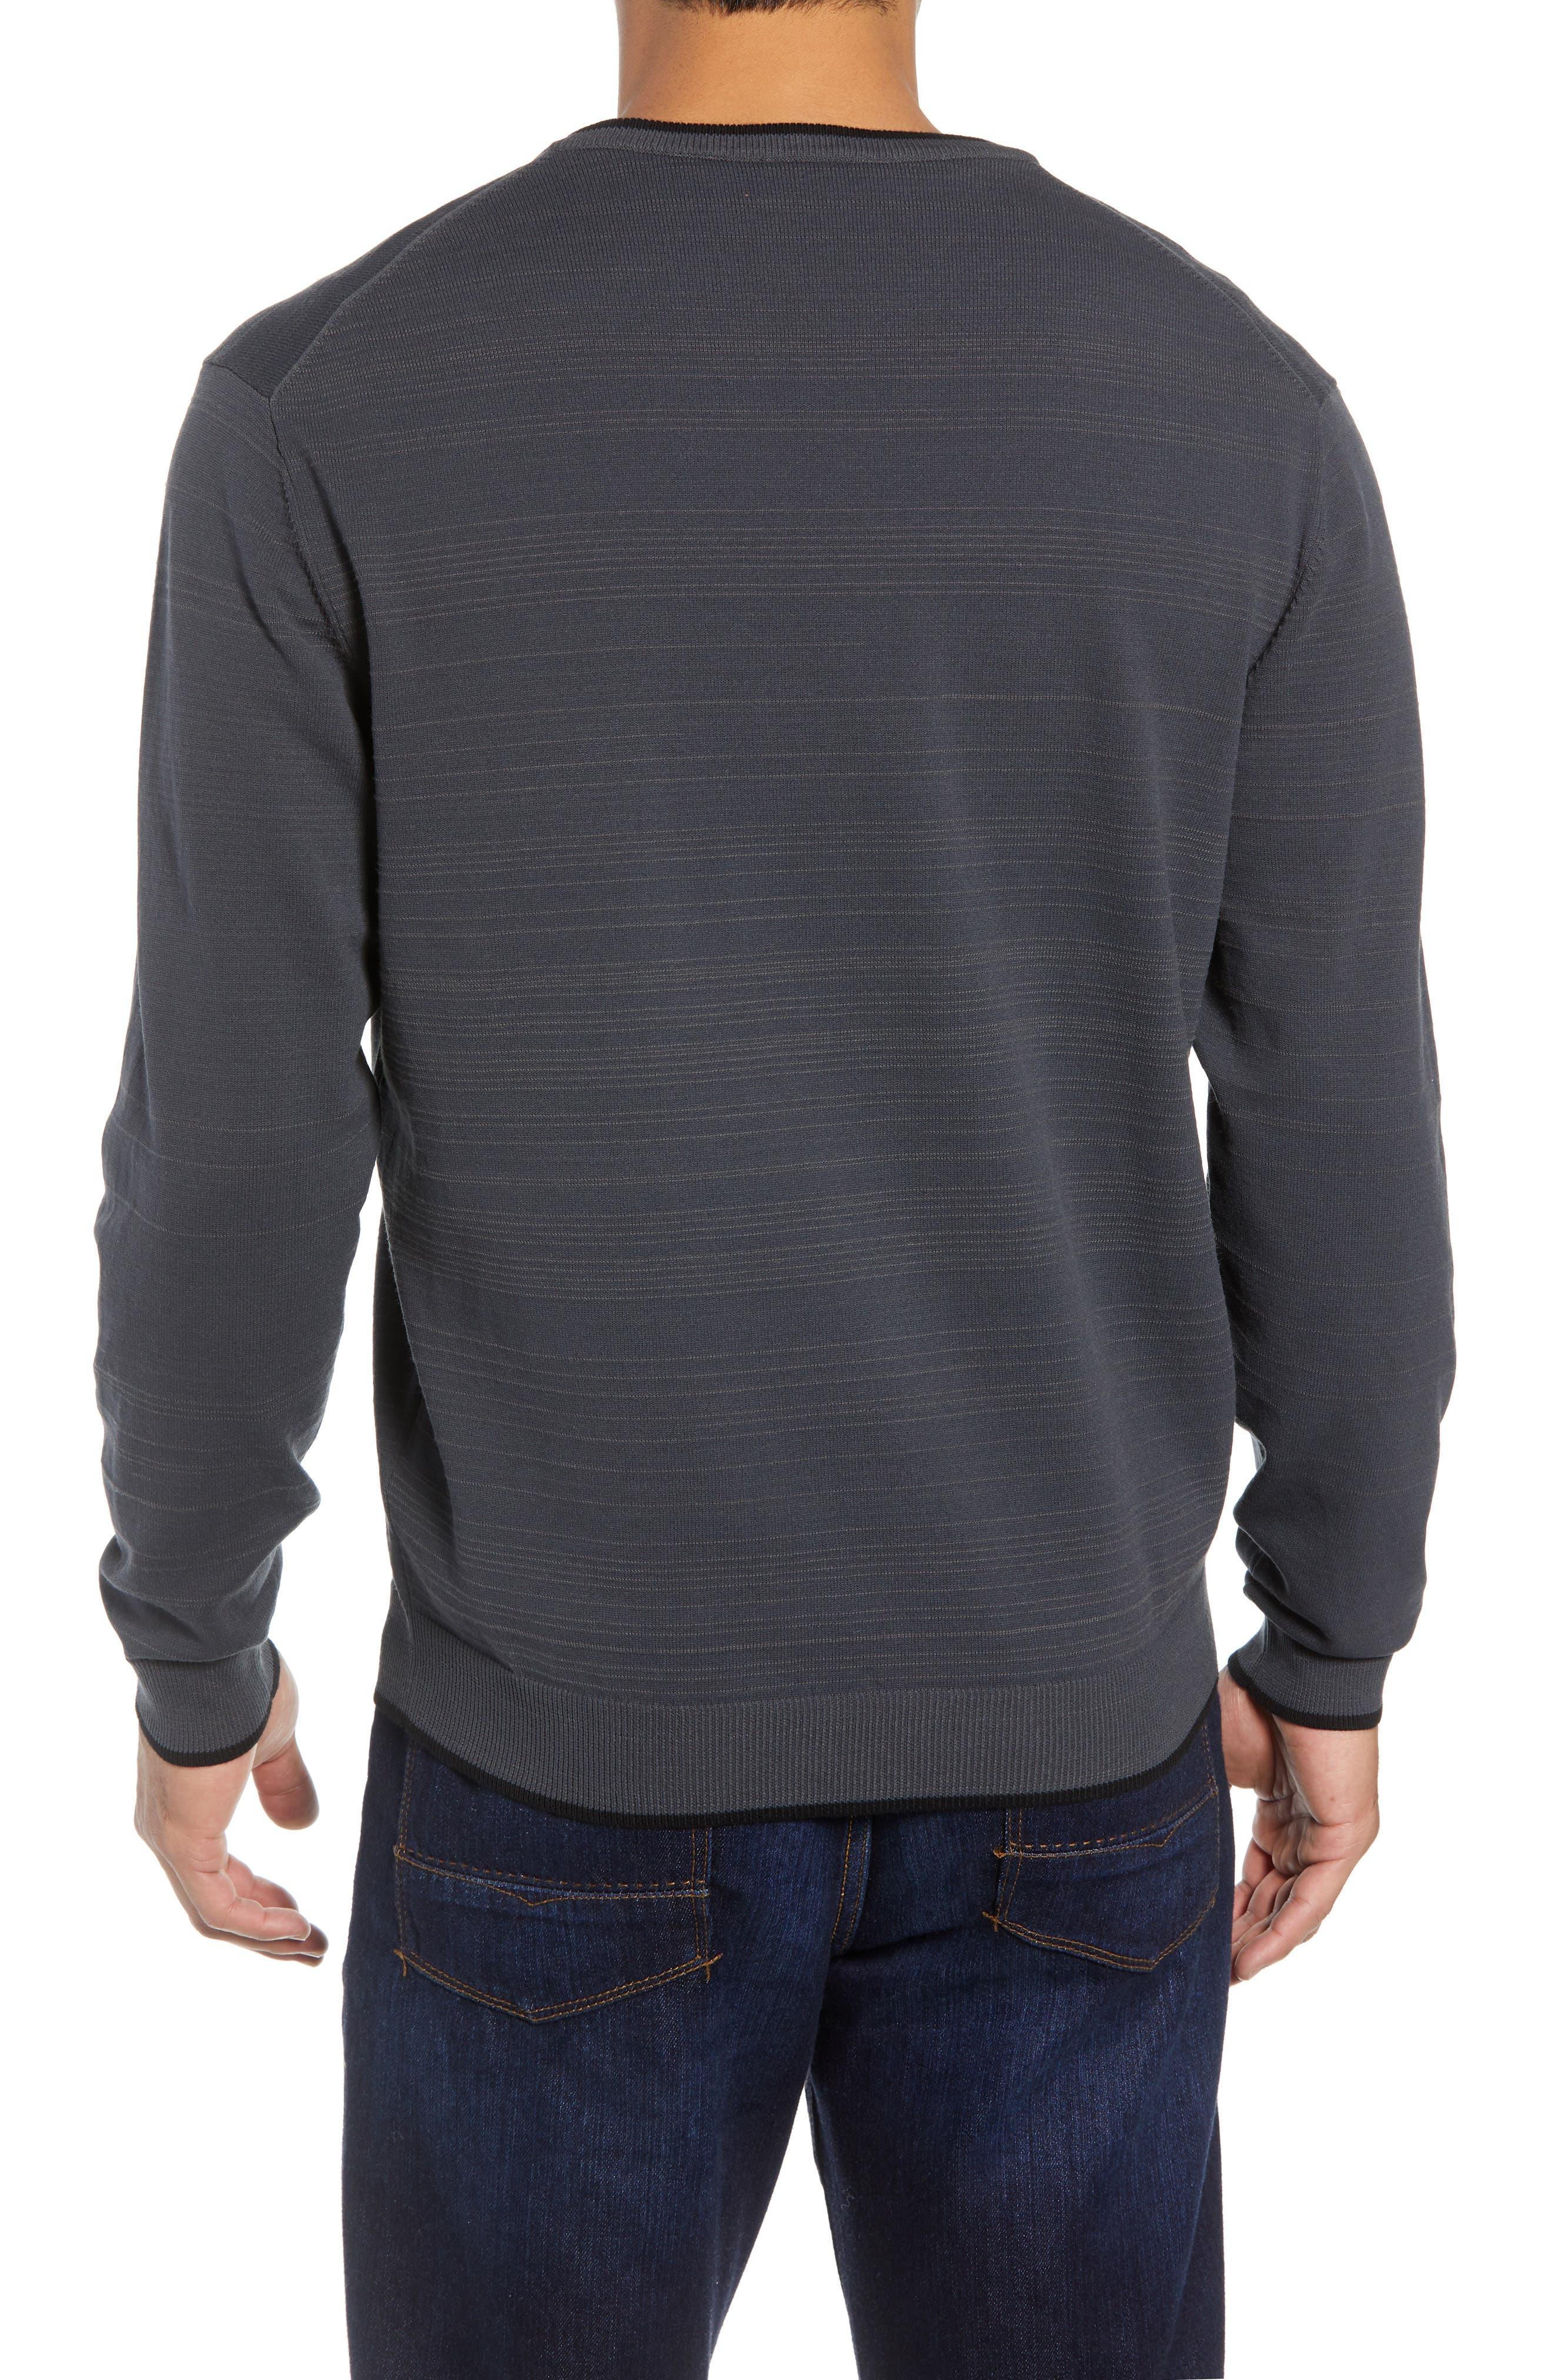 Impact V-Neck Sweater,                             Alternate thumbnail 2, color,                             CHARCOAL